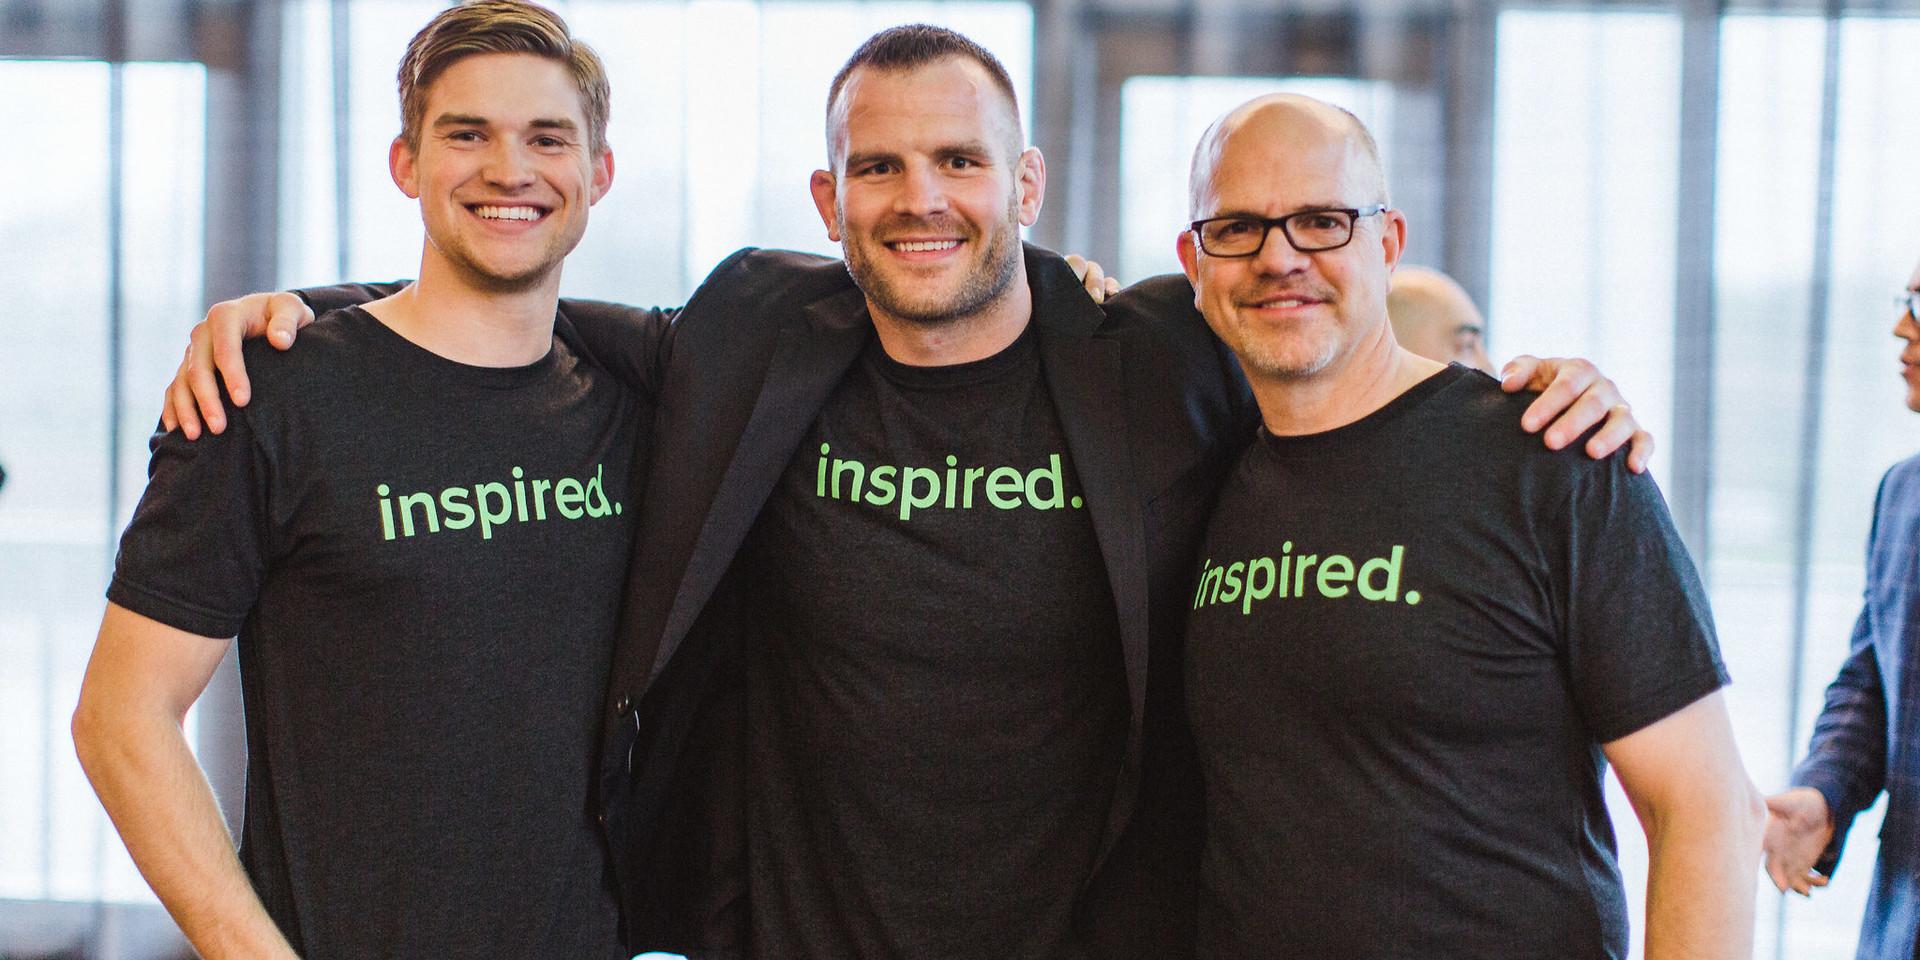 JD & inTeamers - inTeam 2018 Inspiration Award Ceremony